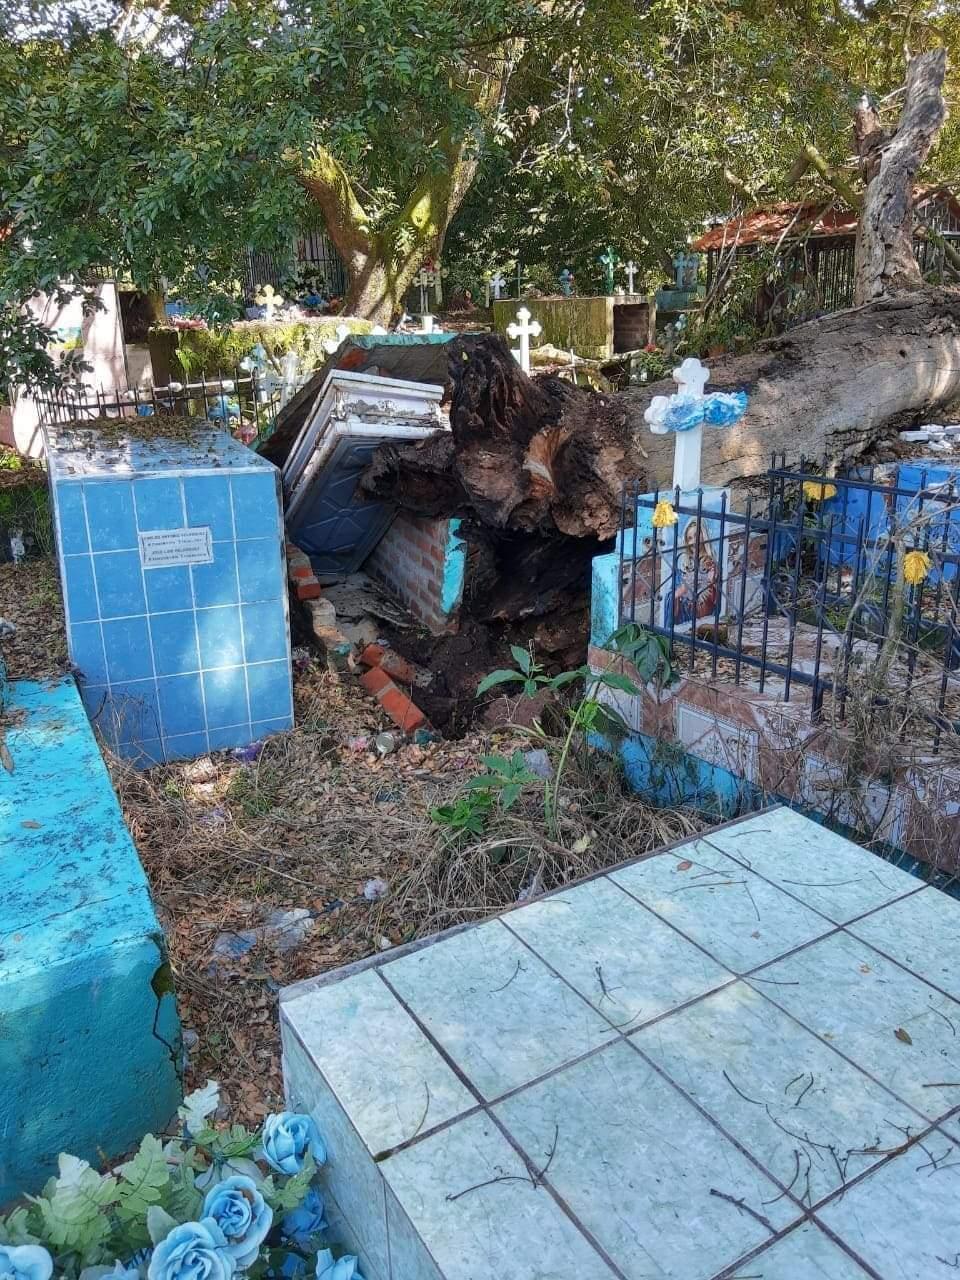 Caída de árbol en un cementerio saca un ataúd con un difunto